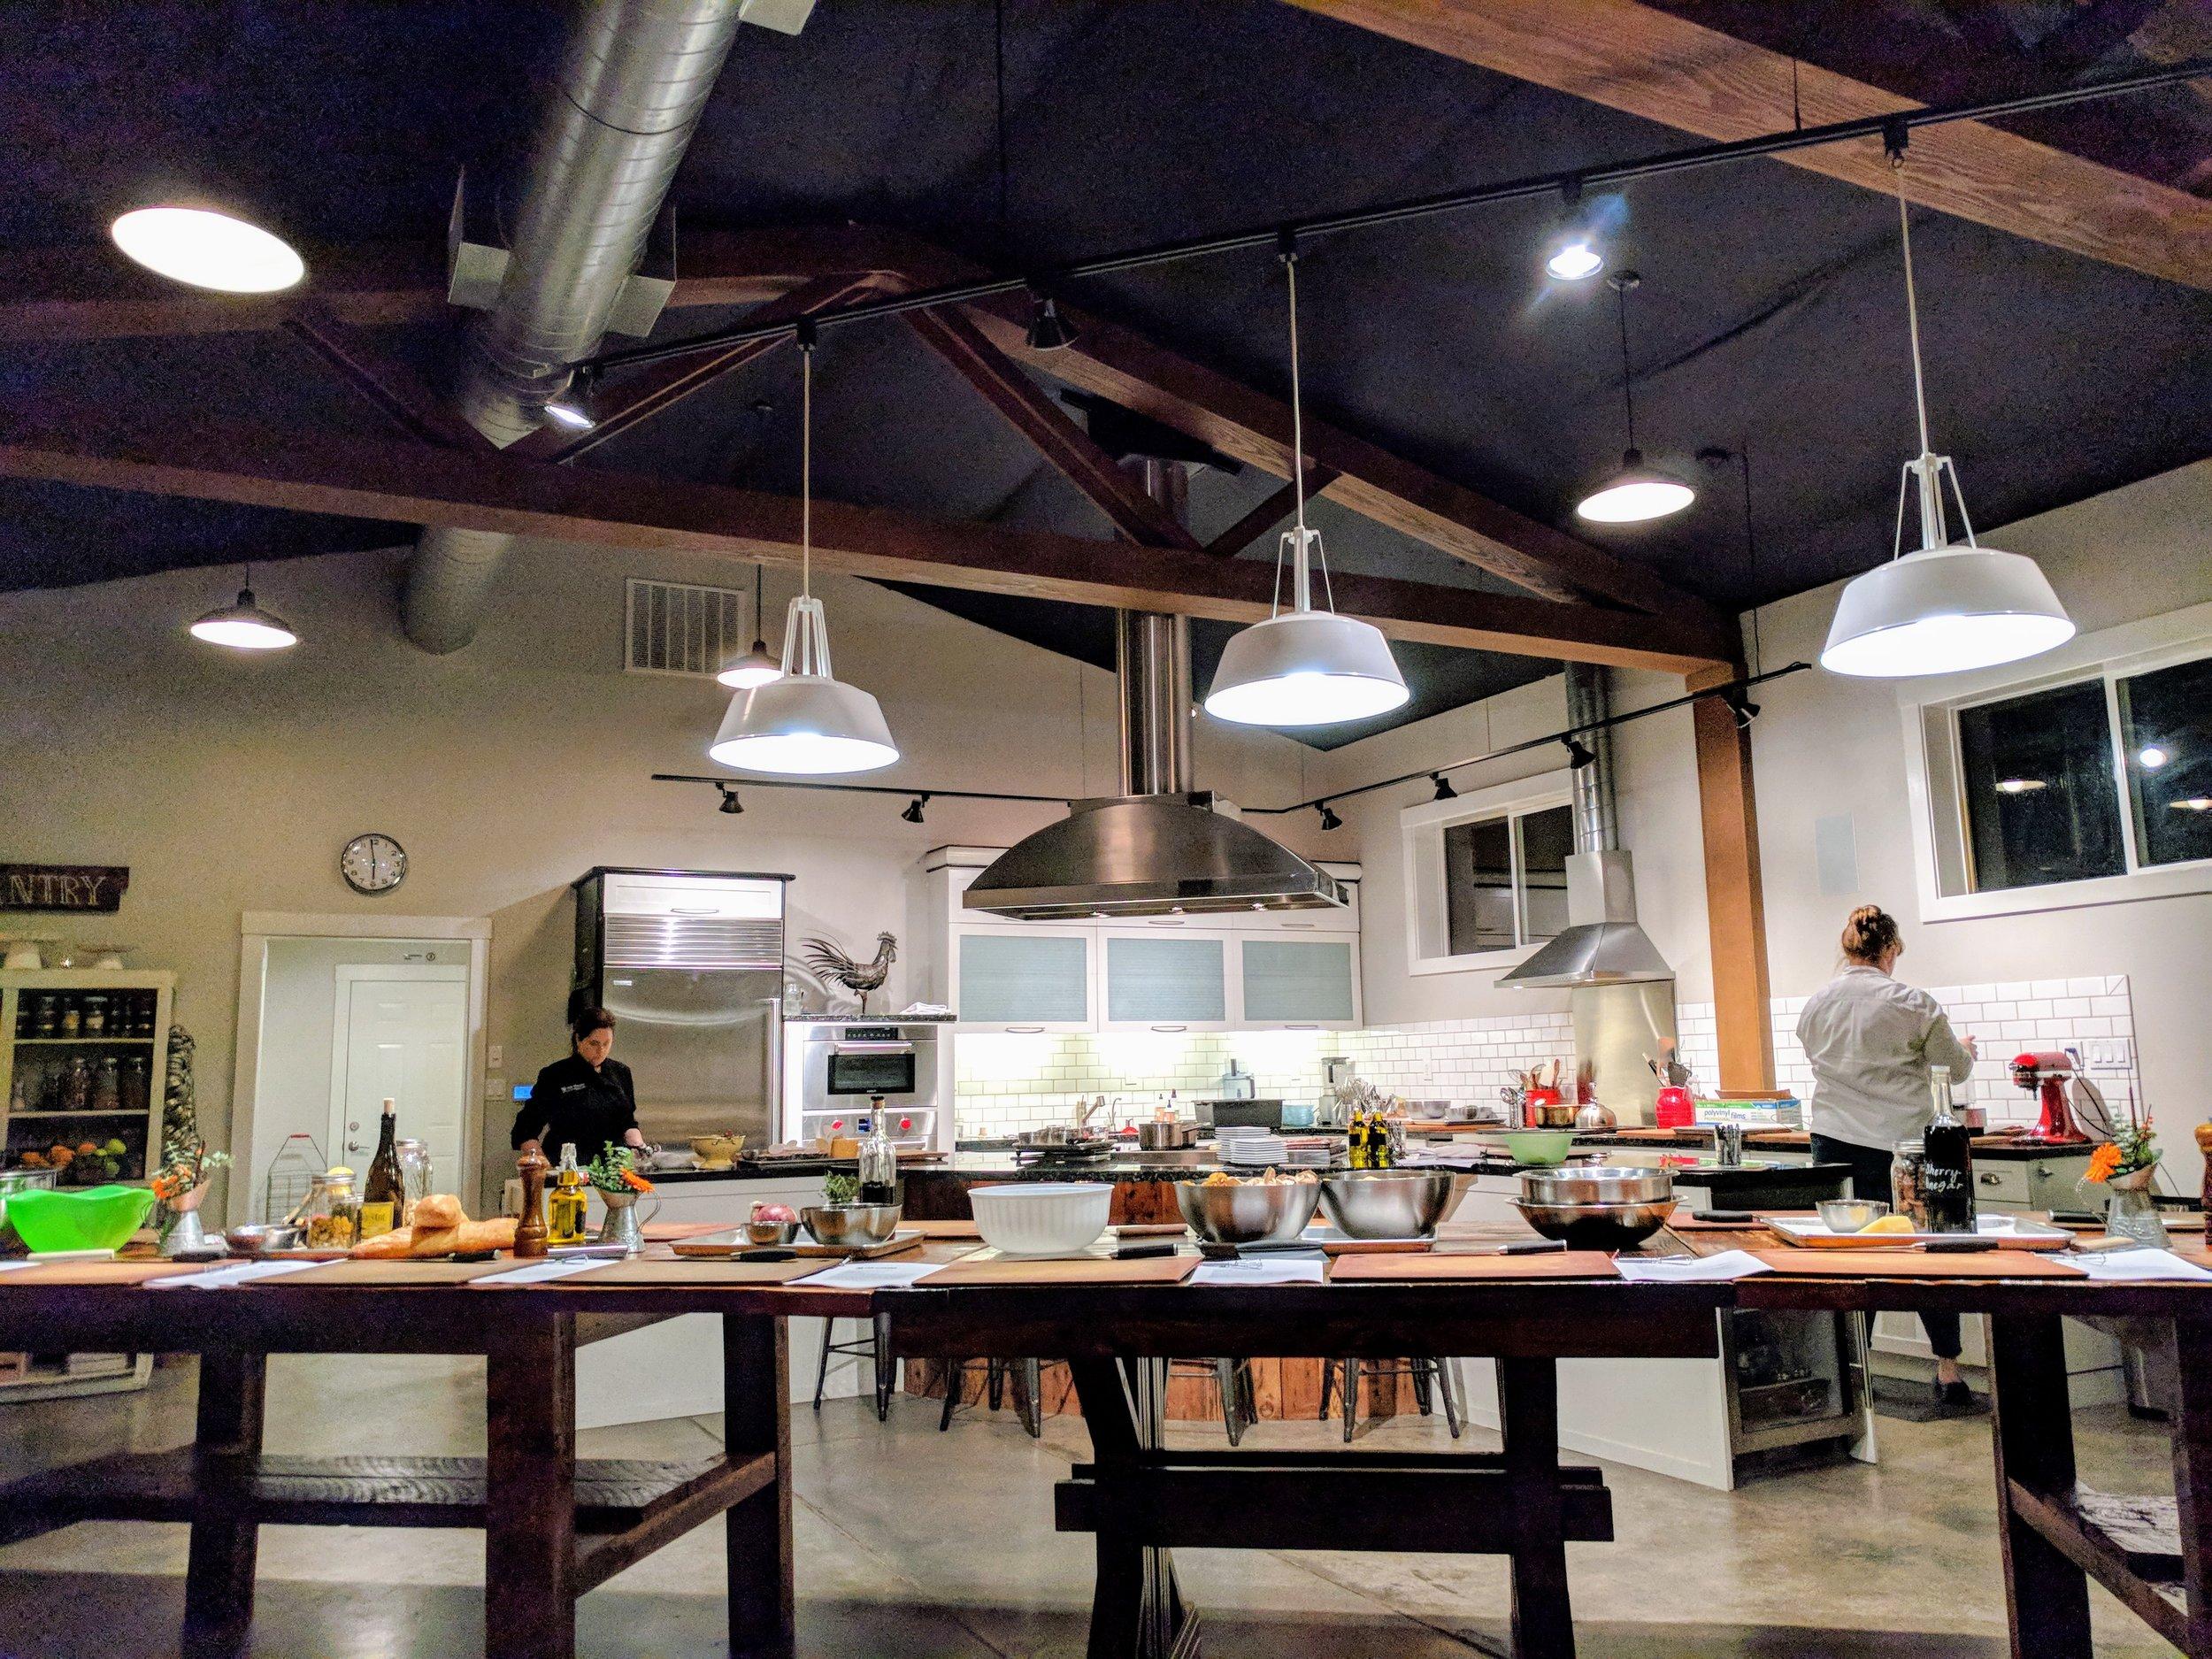 kitchen-at-middleground-farms-barn.jpg